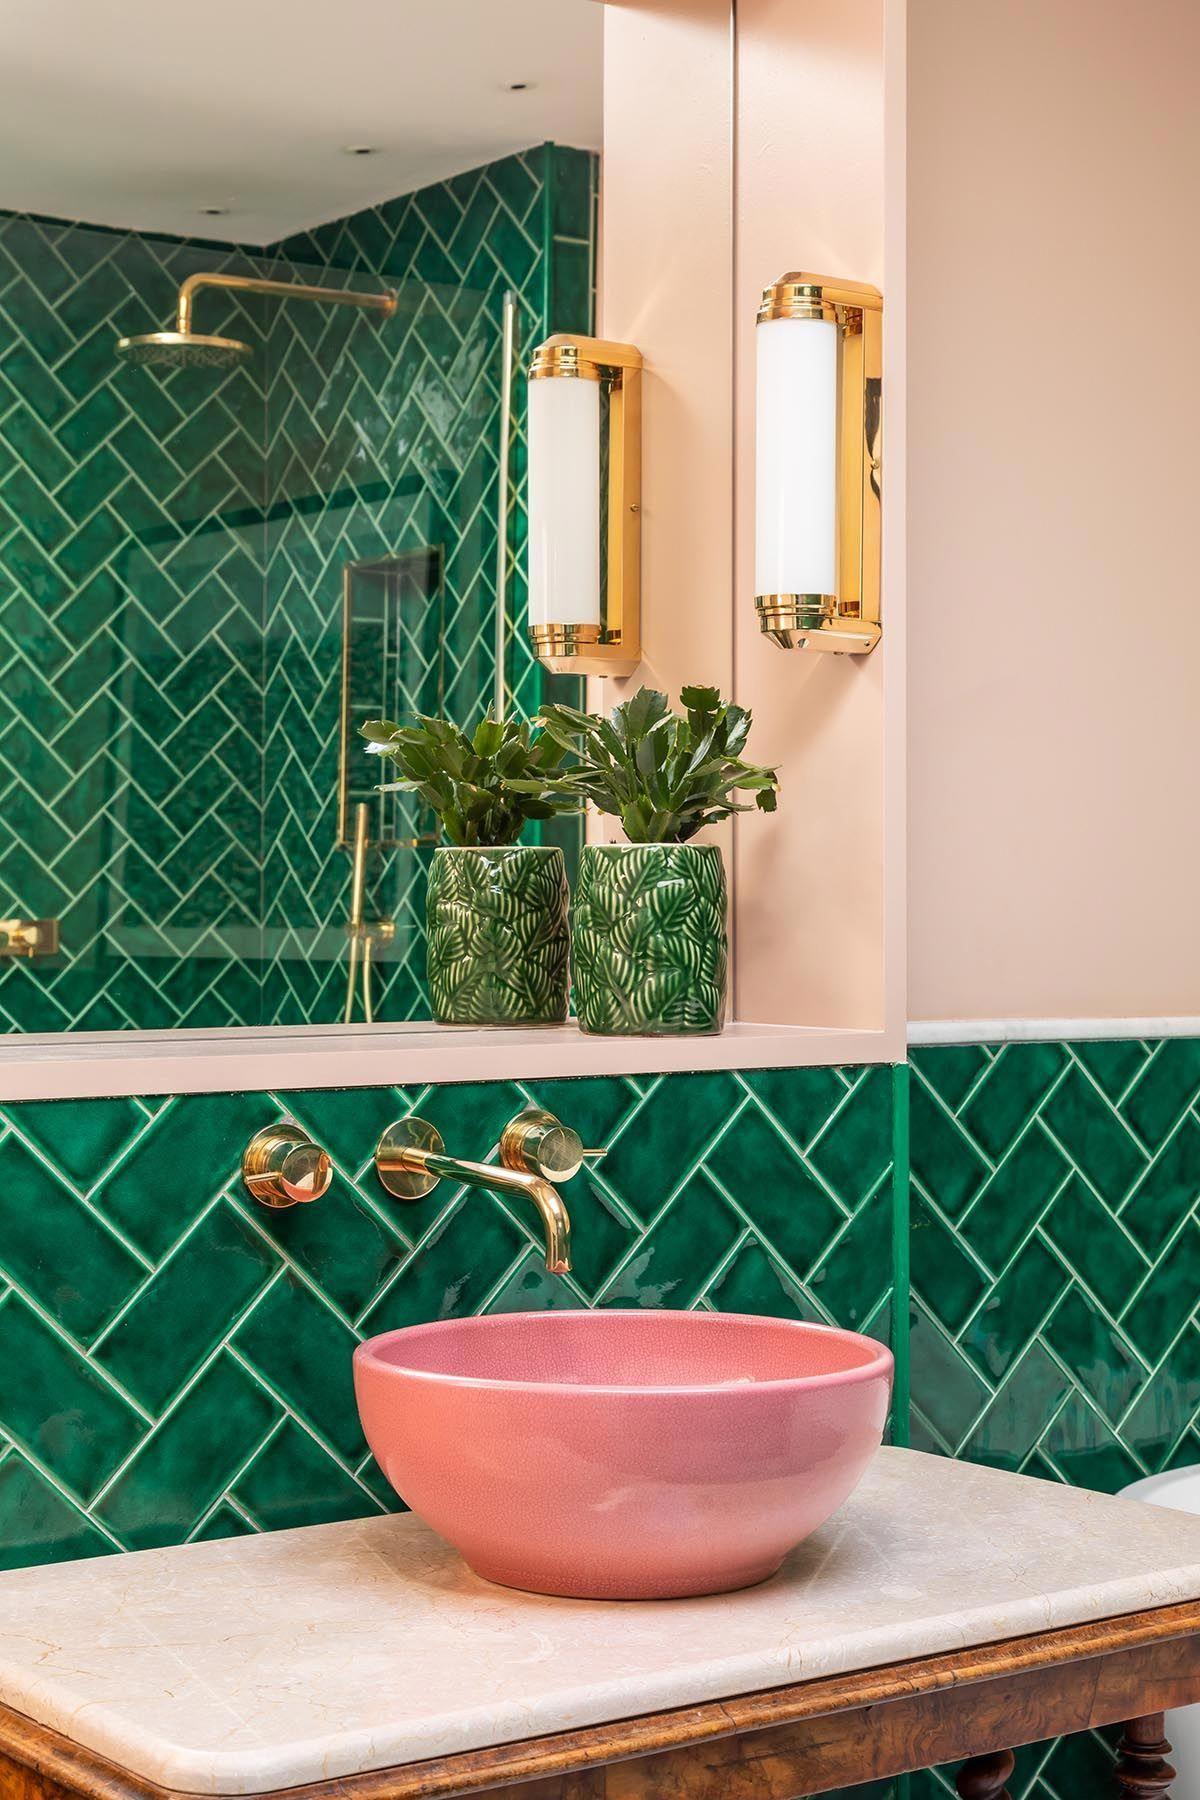 Sagegreenbathrooms Bathroom Inspiration Decor Bright Apartment London Apartment